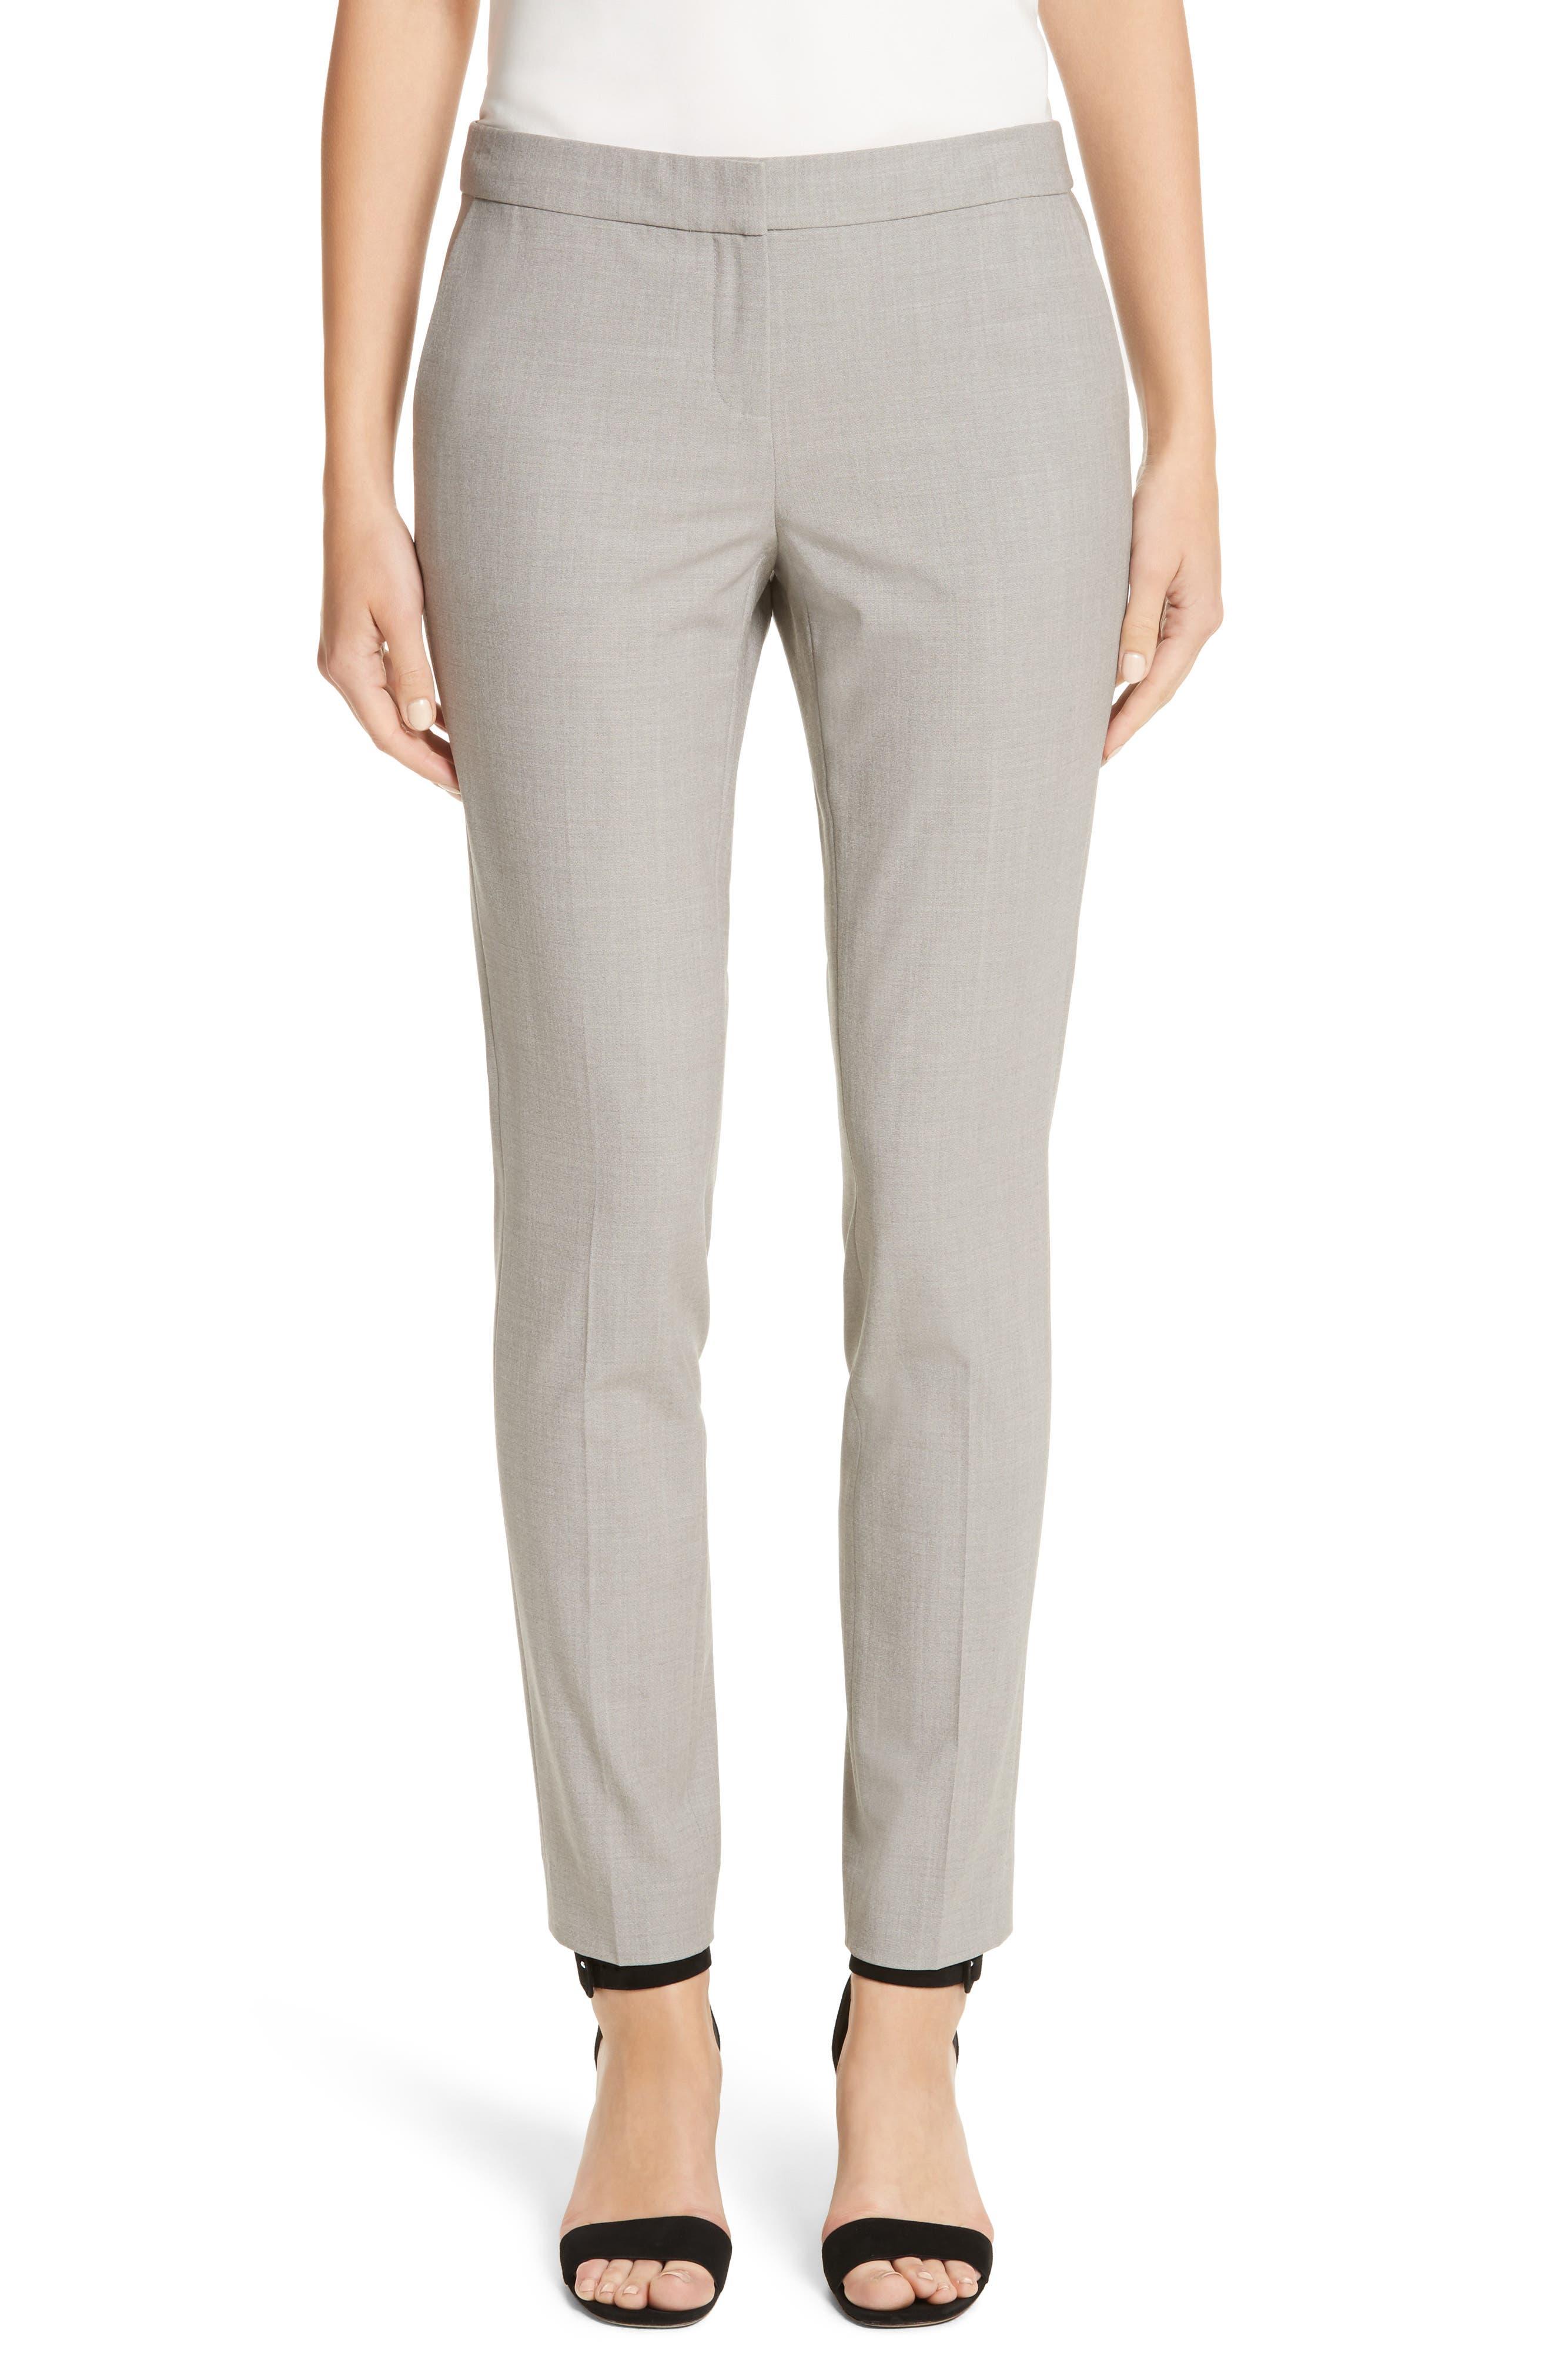 Manhattan Slim Pants,                             Main thumbnail 1, color,                             Feather Grey Melange